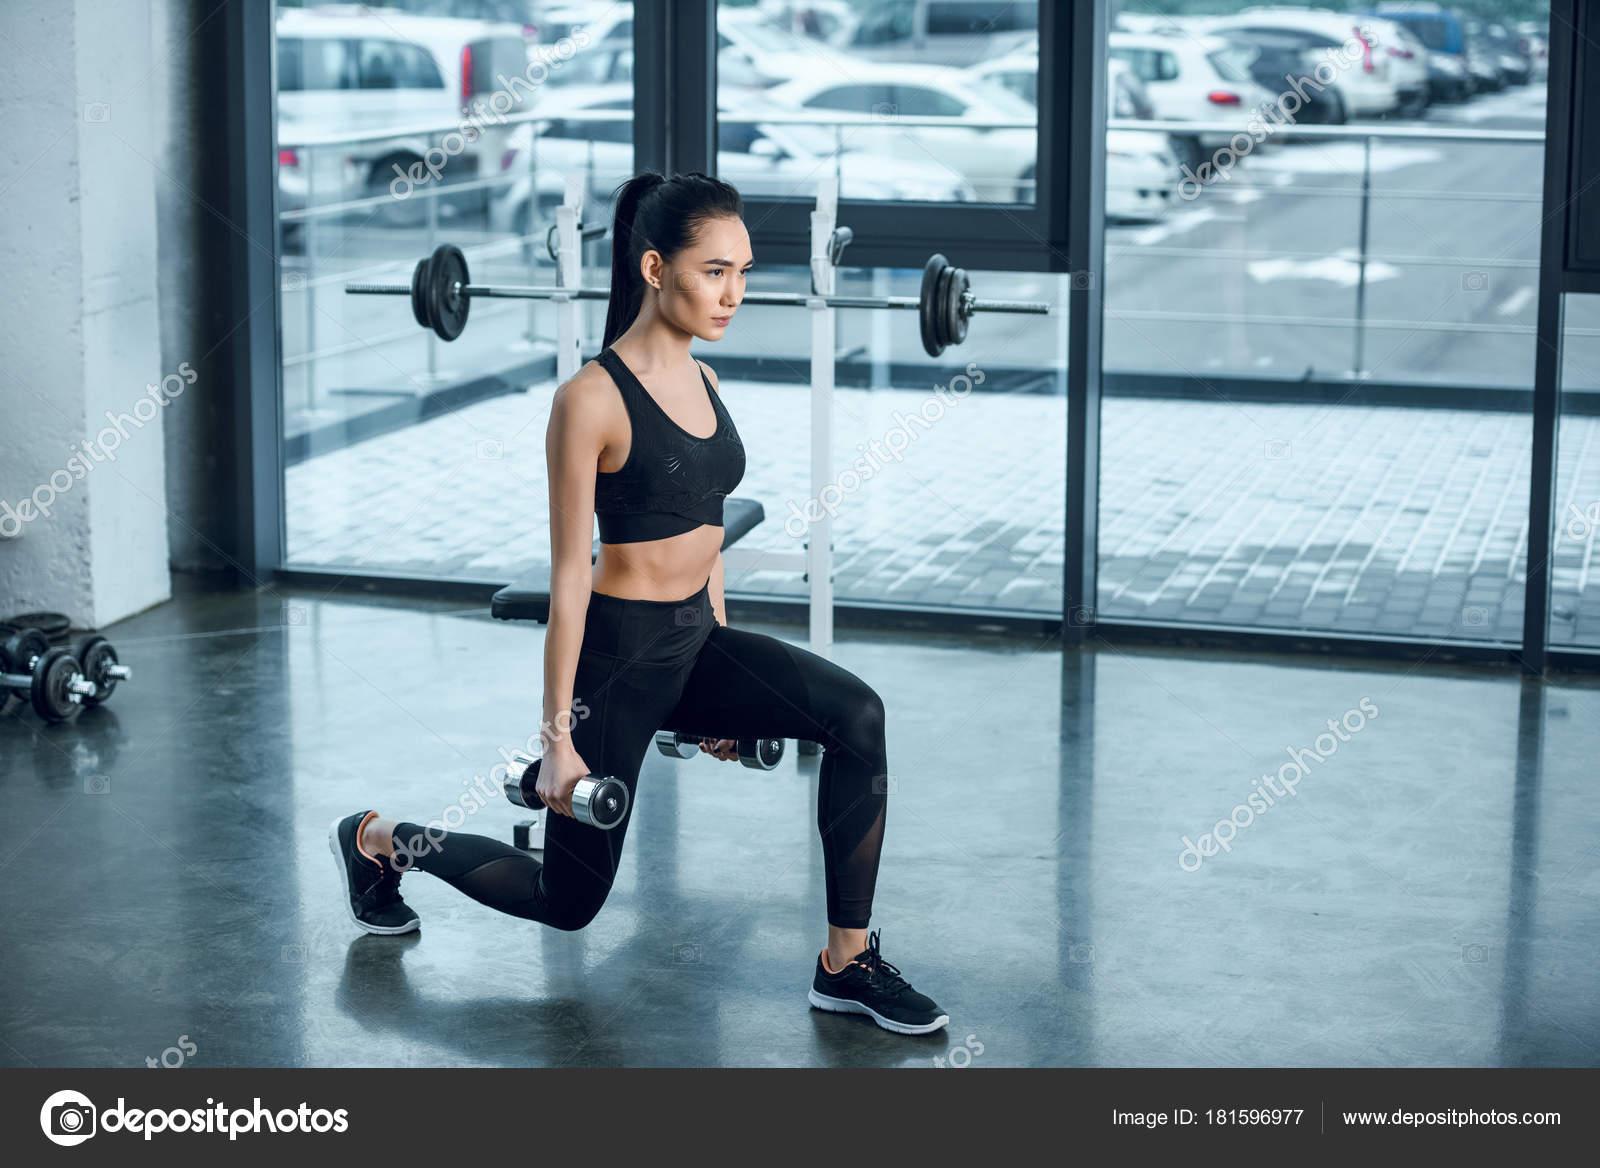 Young Sporty Woman Doing Single Leg Squats Dumbbells Gym